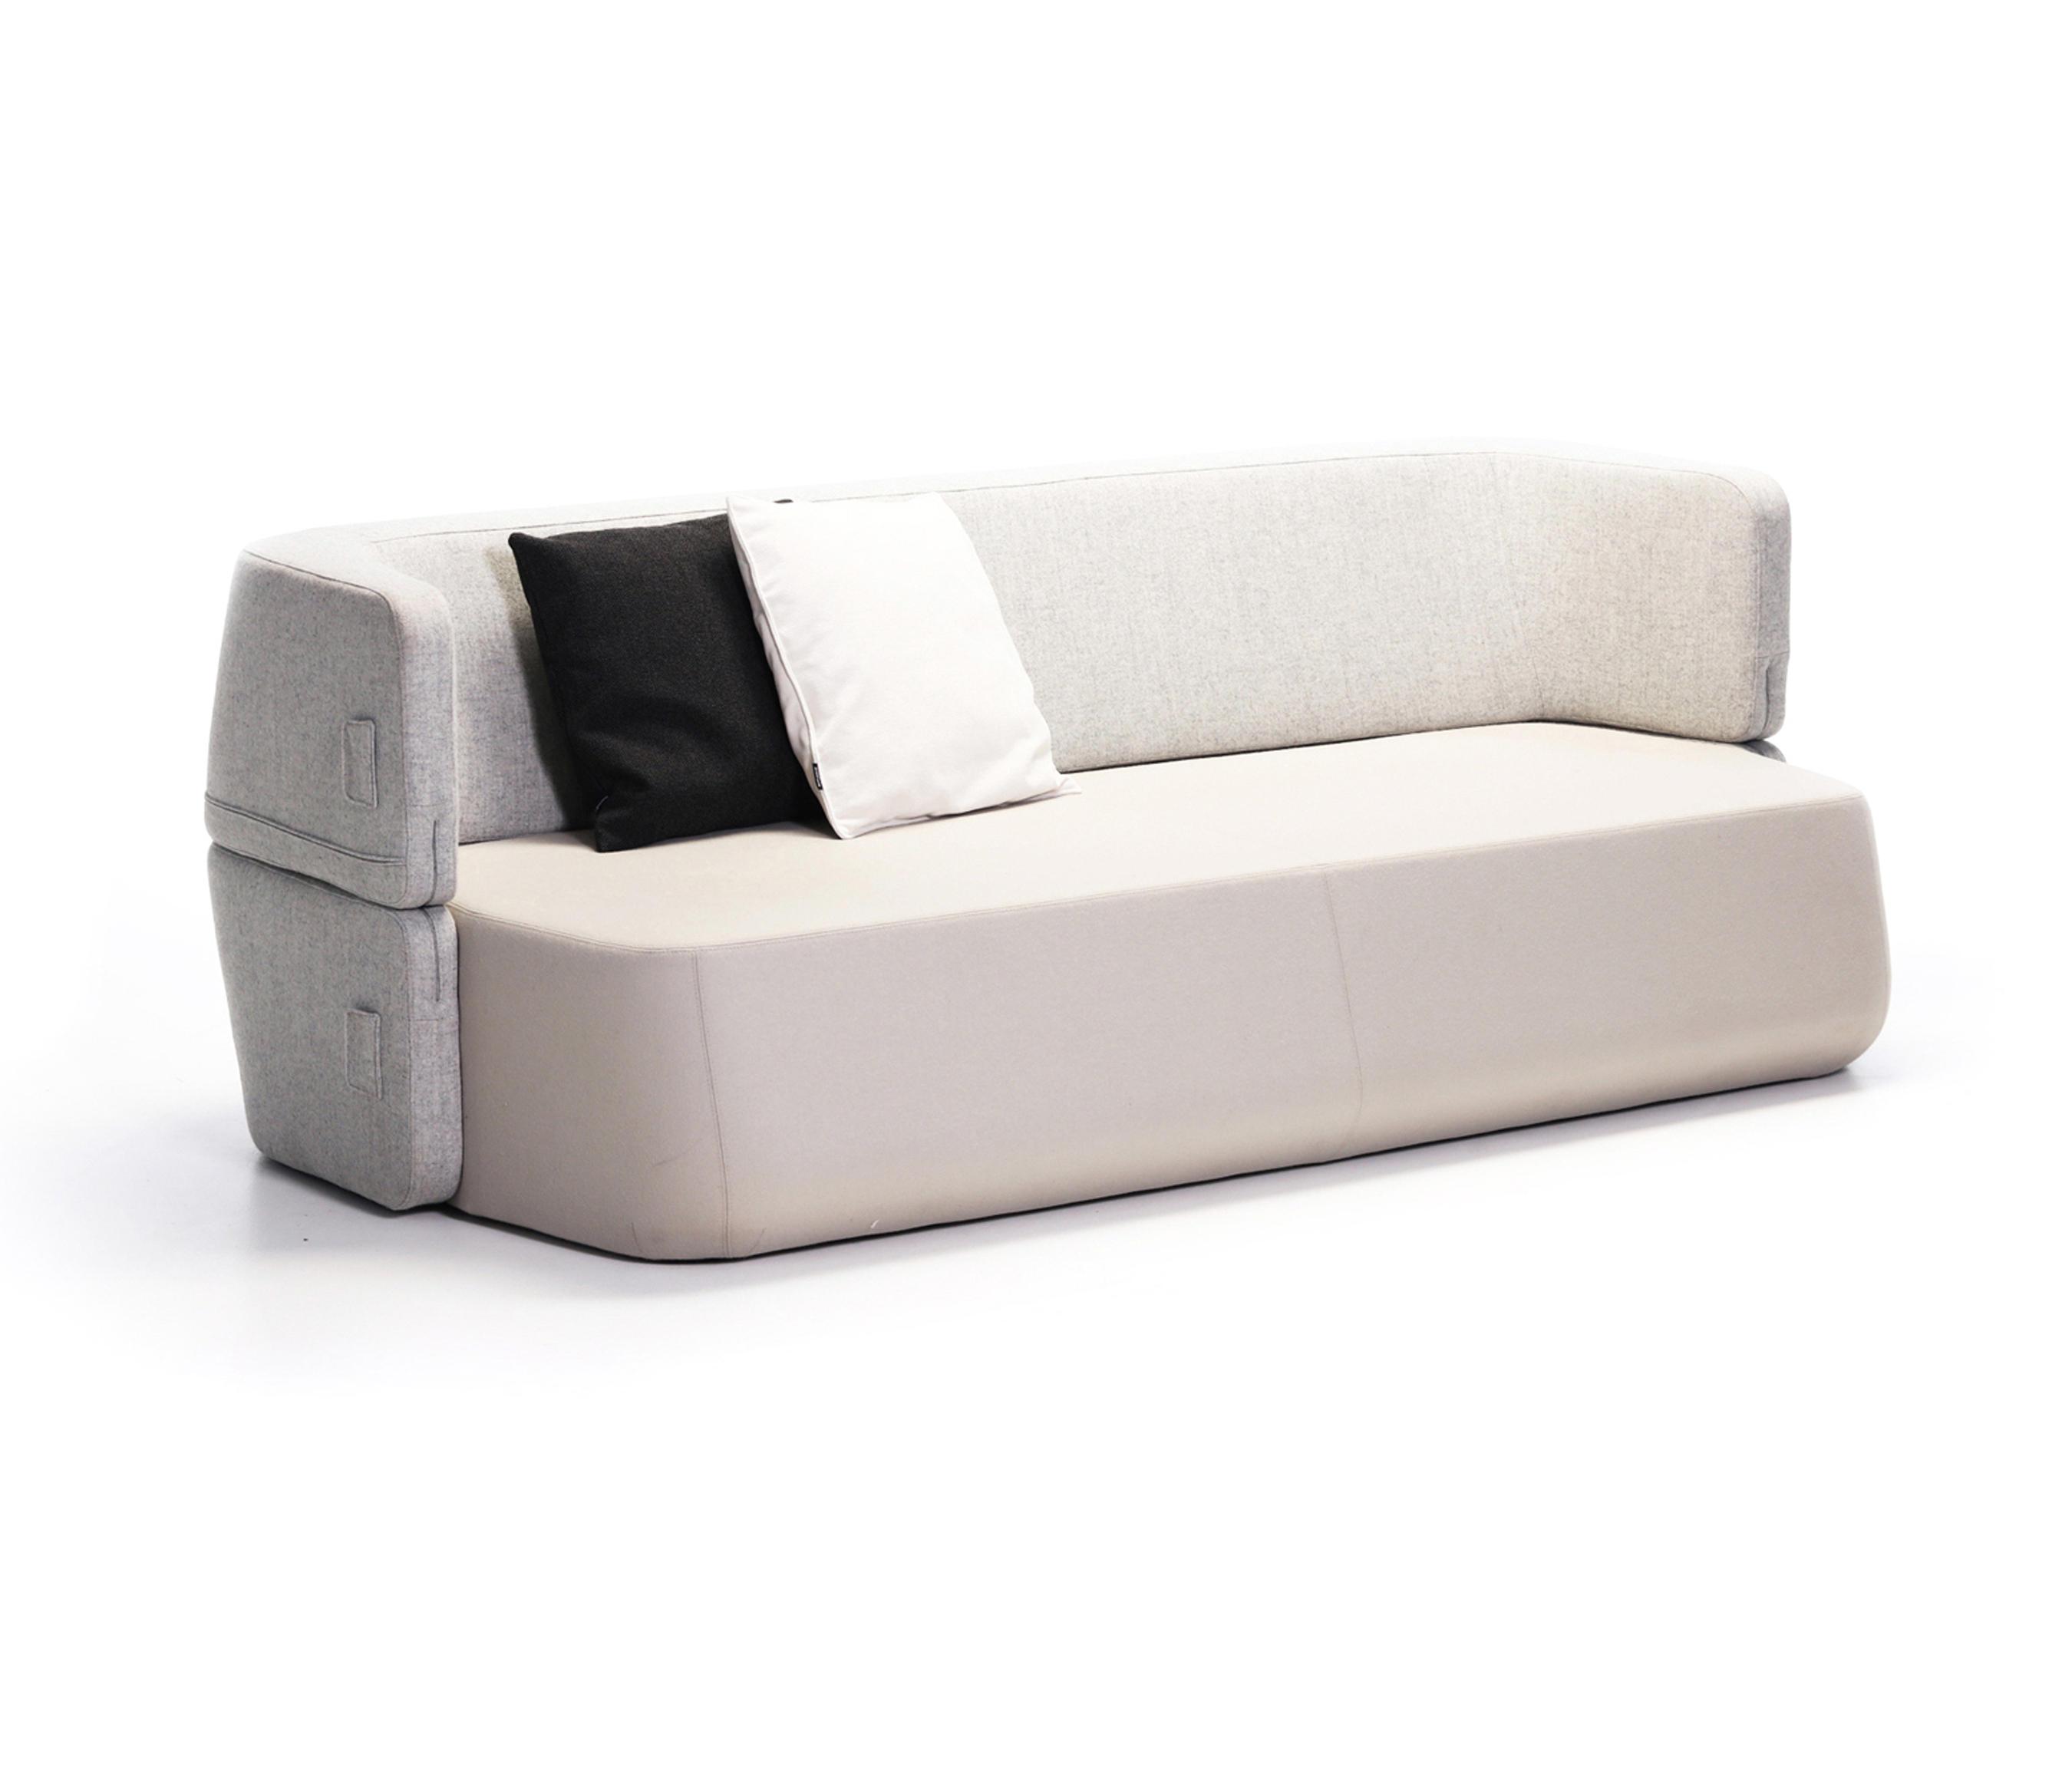 REVOLVE SCHLAFSOFA - Sofas von Prostoria | Architonic